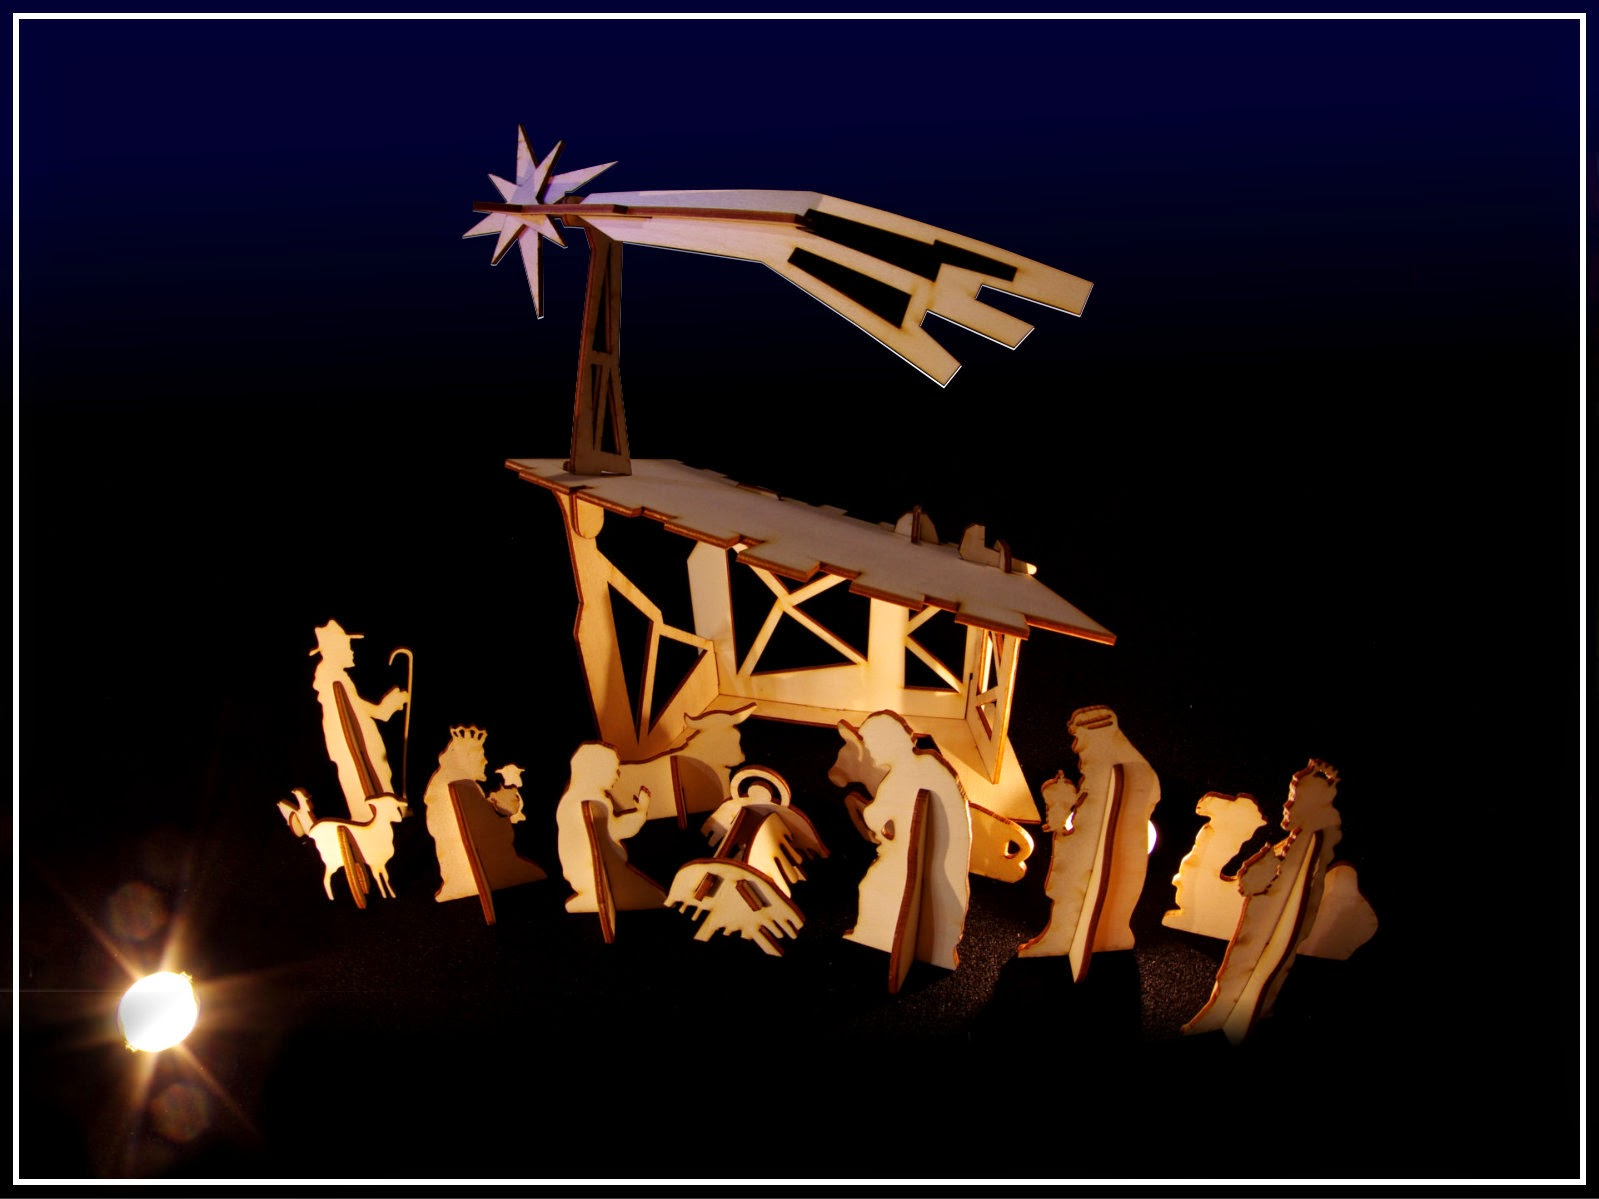 a good mix of creativity christmas nativity set 2014